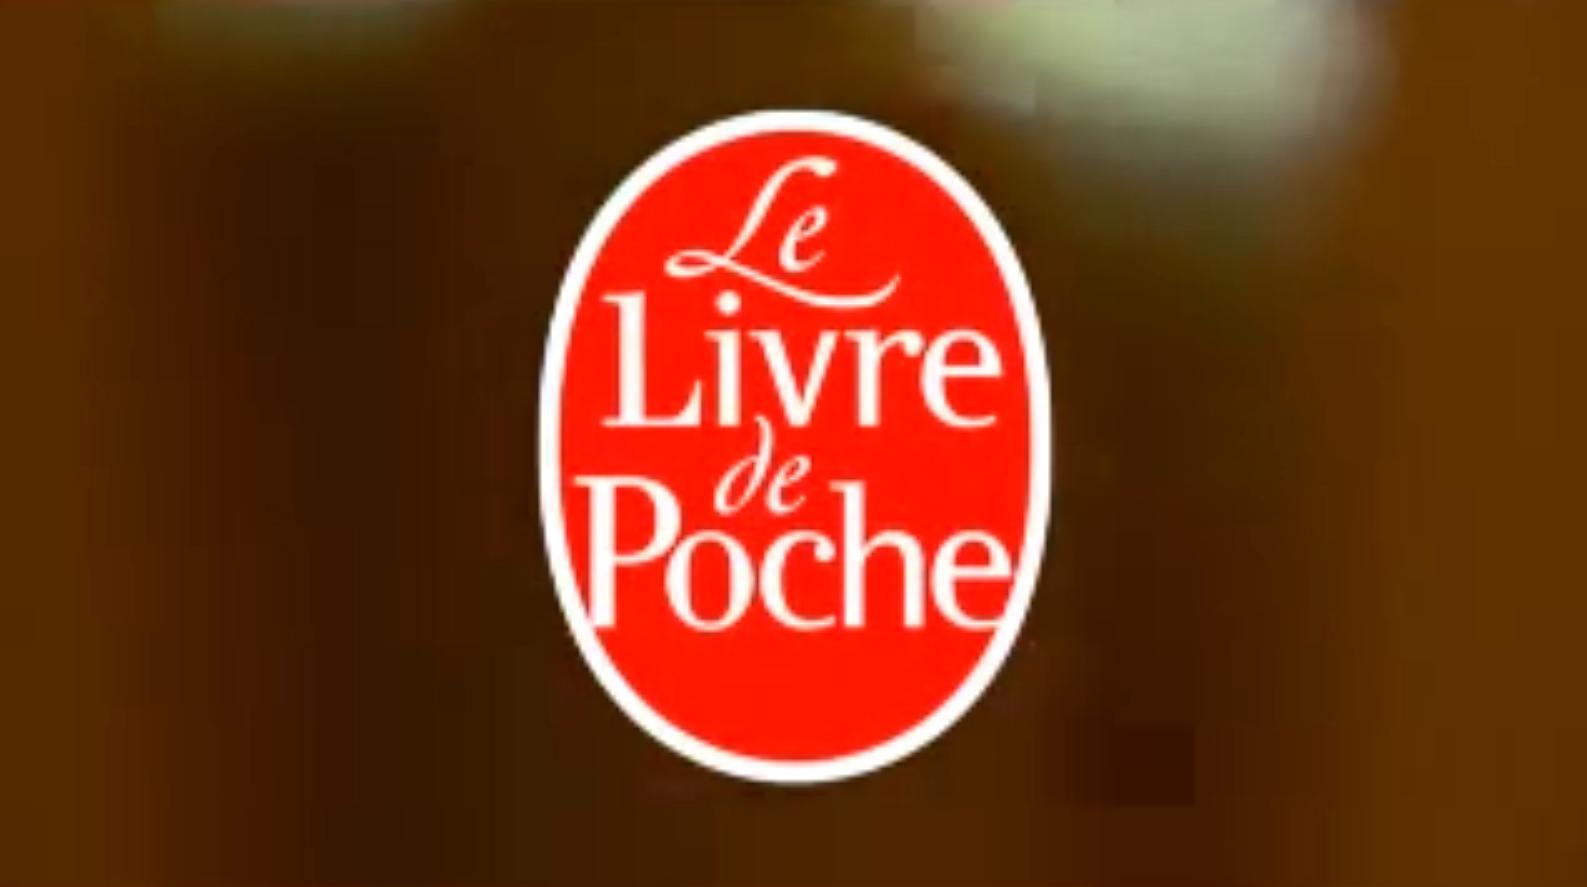 Le Livre De Poche Logo Livreetvin Fr